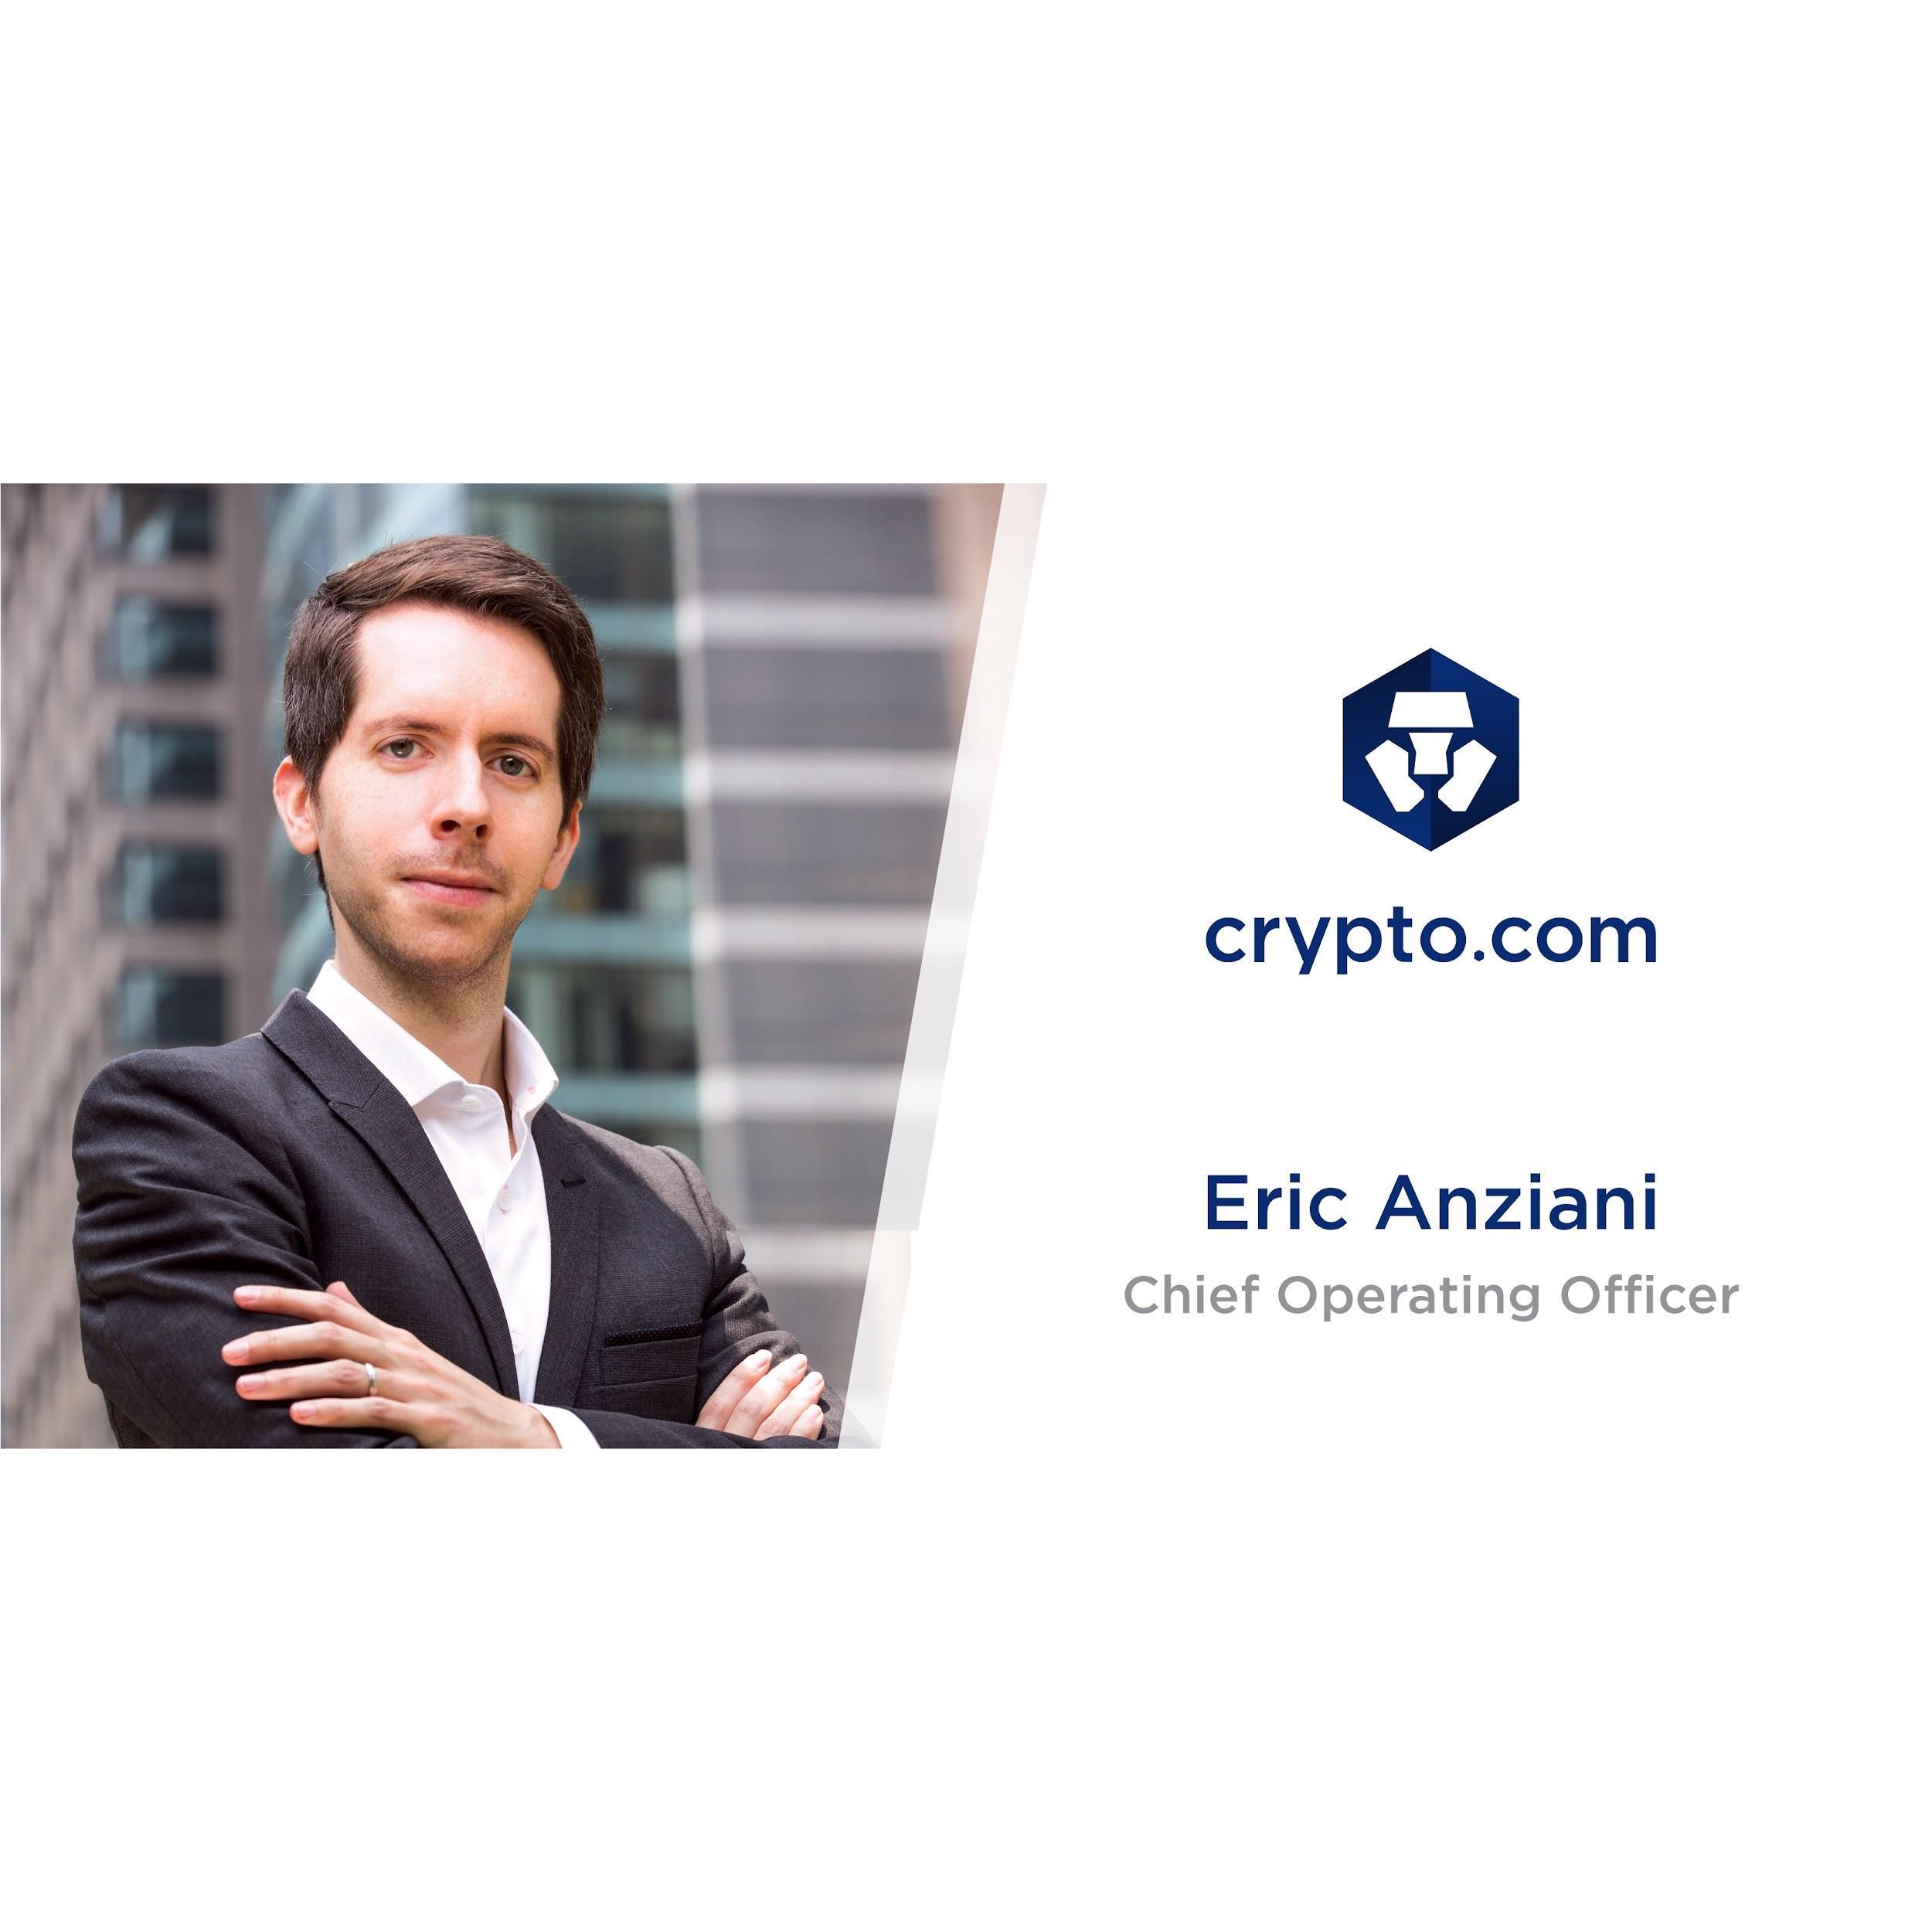 Eric Anziani Crypto.com